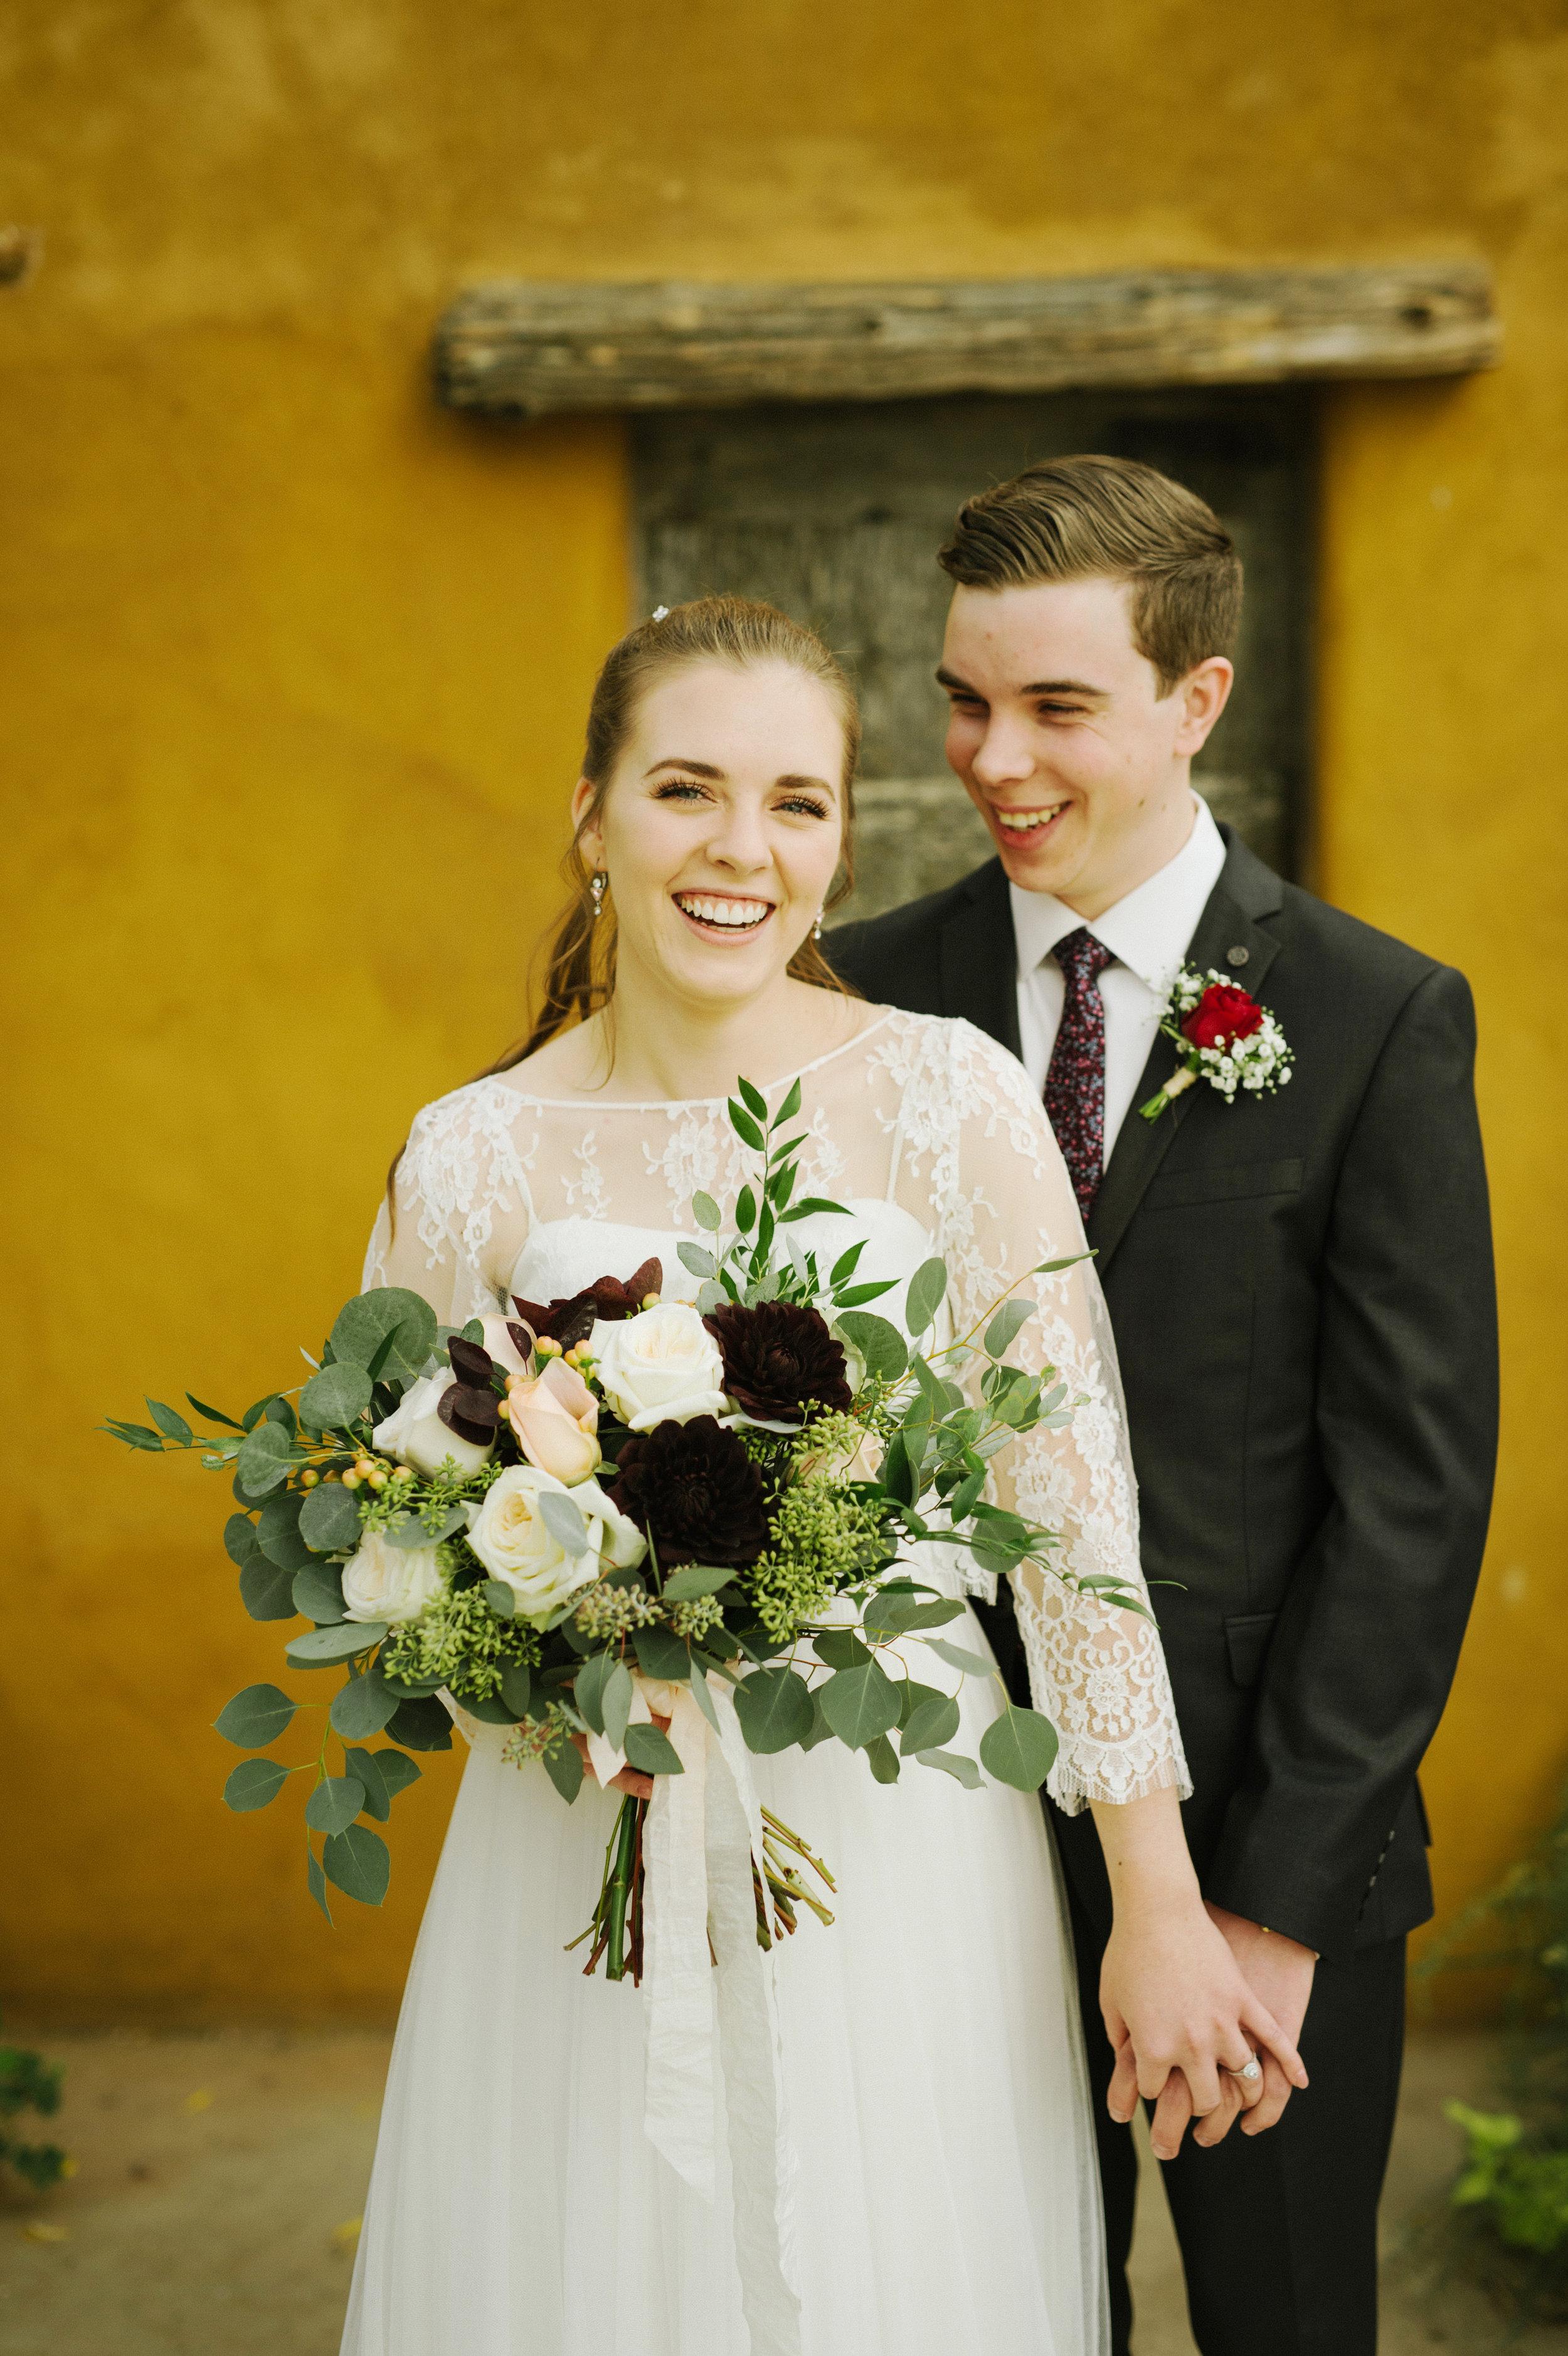 Calgary_Wedding_Photography_Chantelle_Alex_Married_2018_HR001.jpg